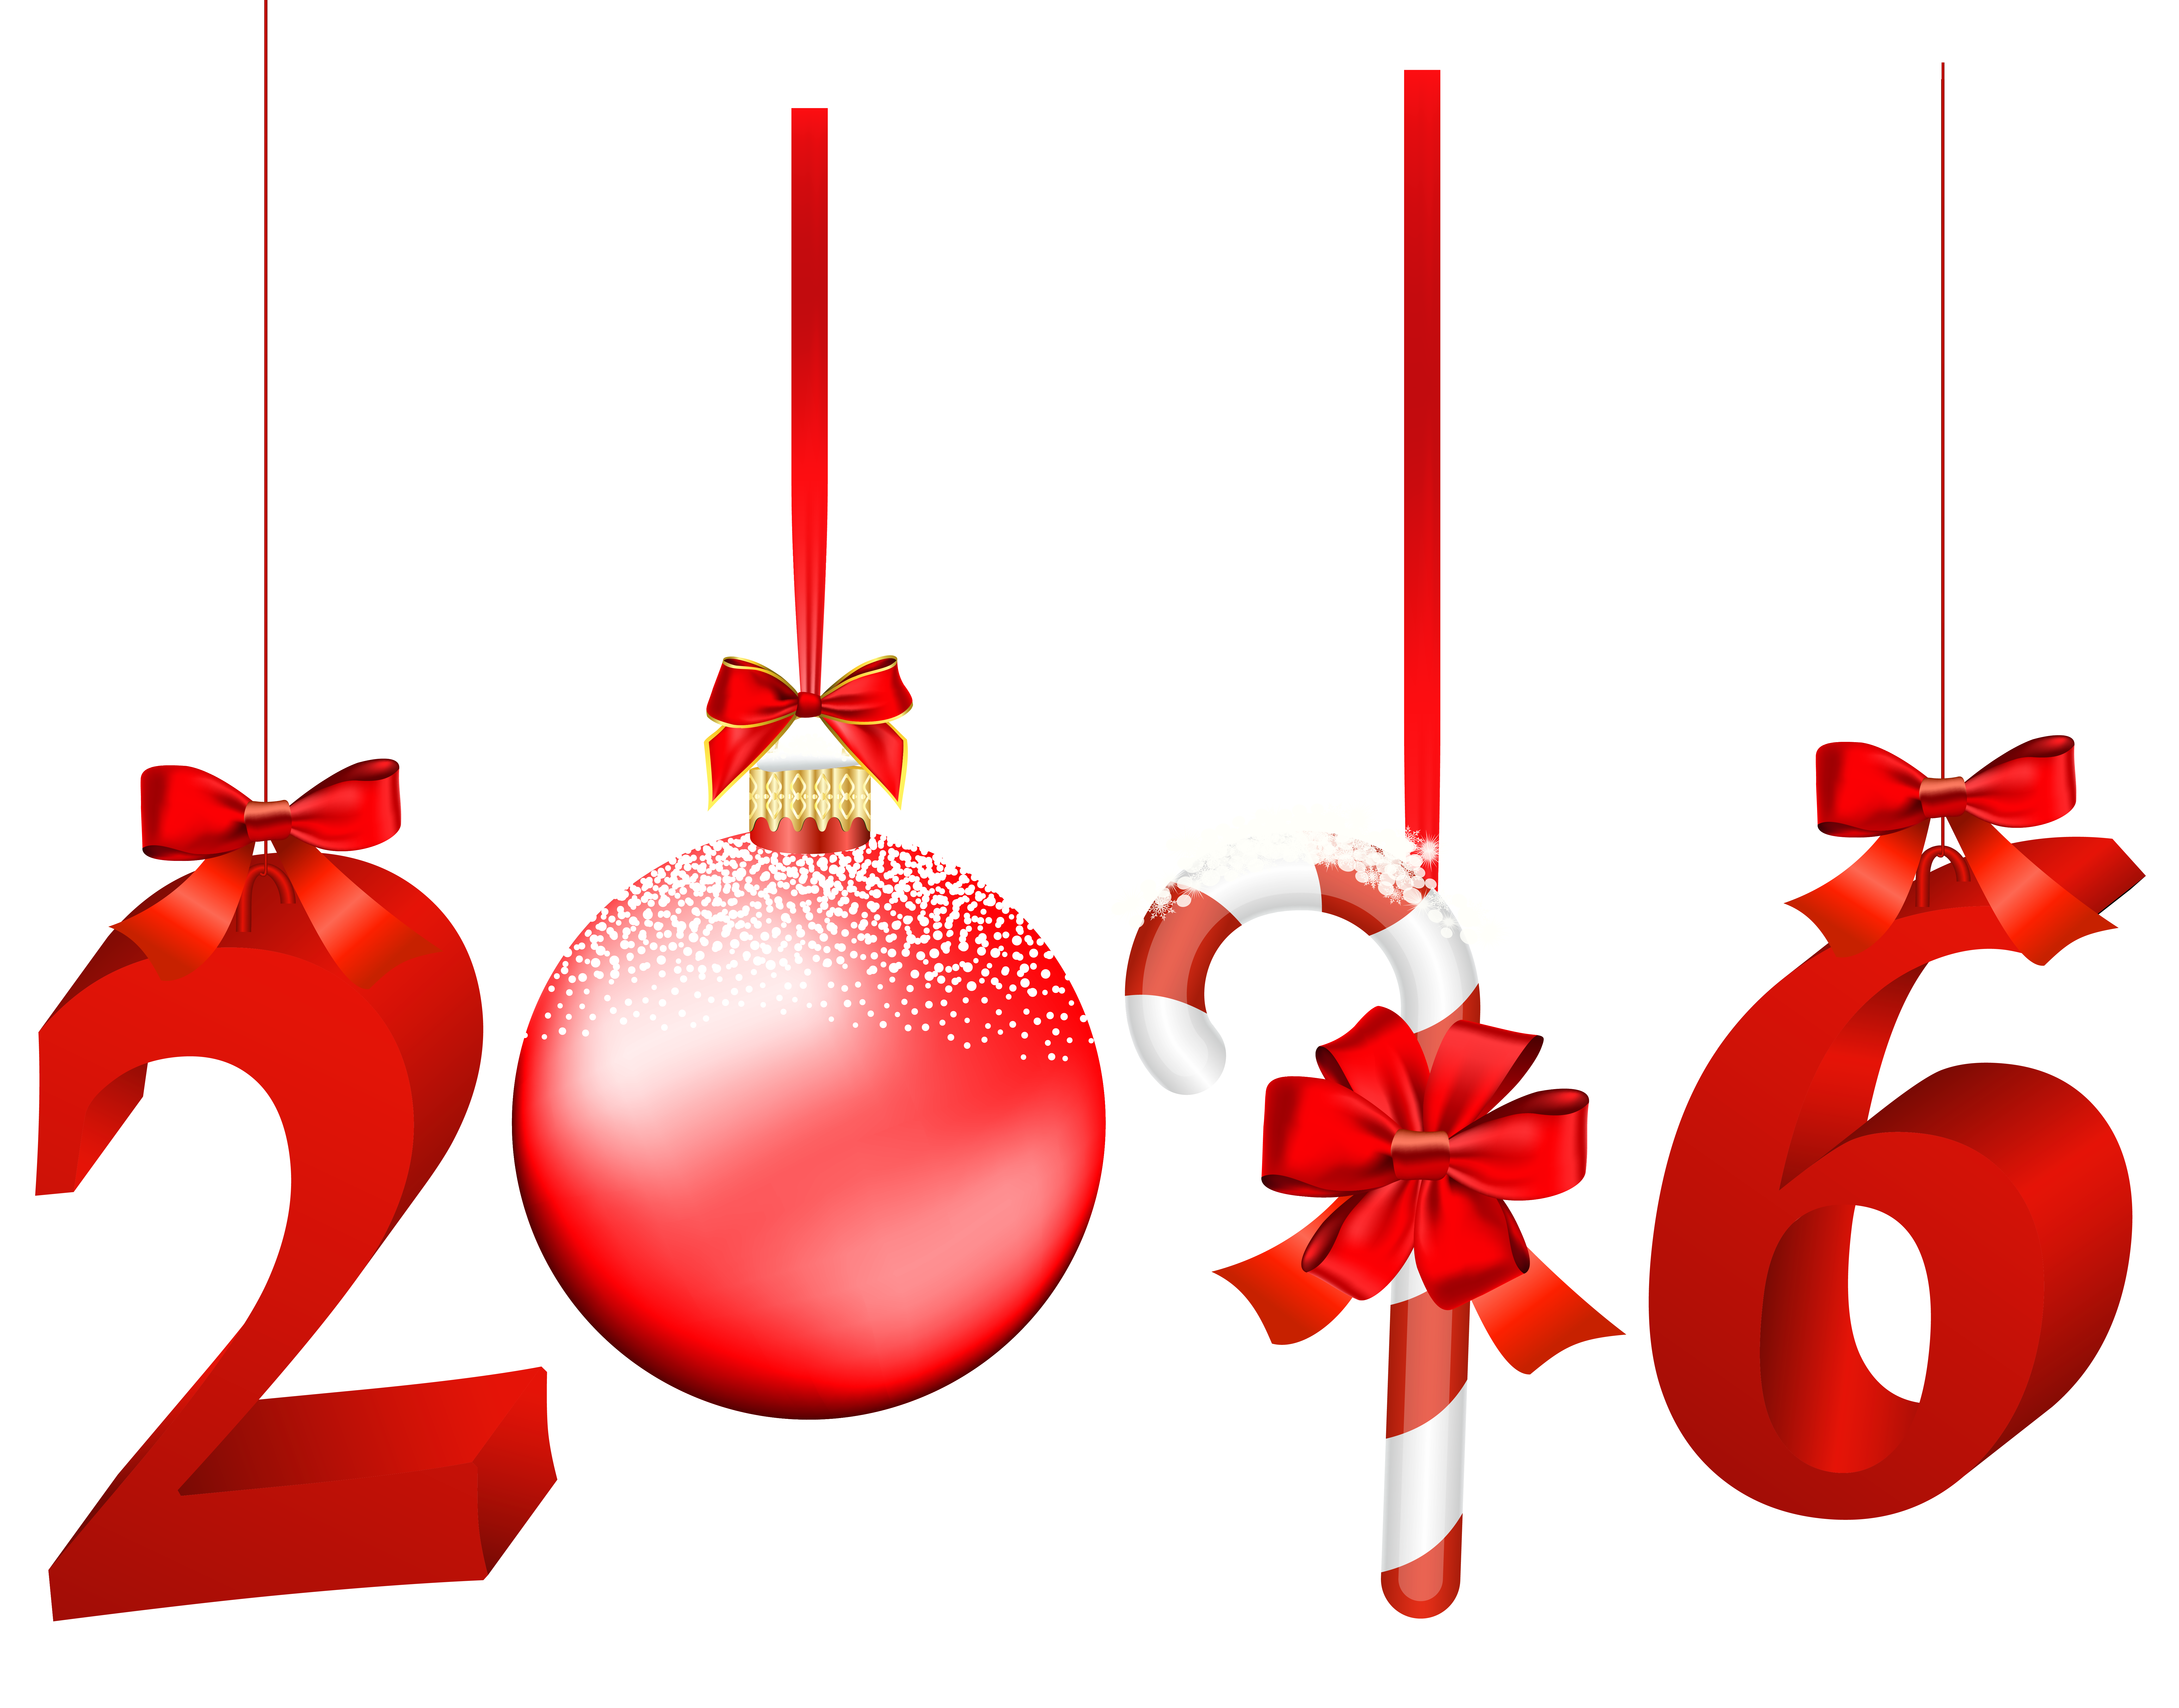 2016 Red Transparent PNG Clip Art Image.